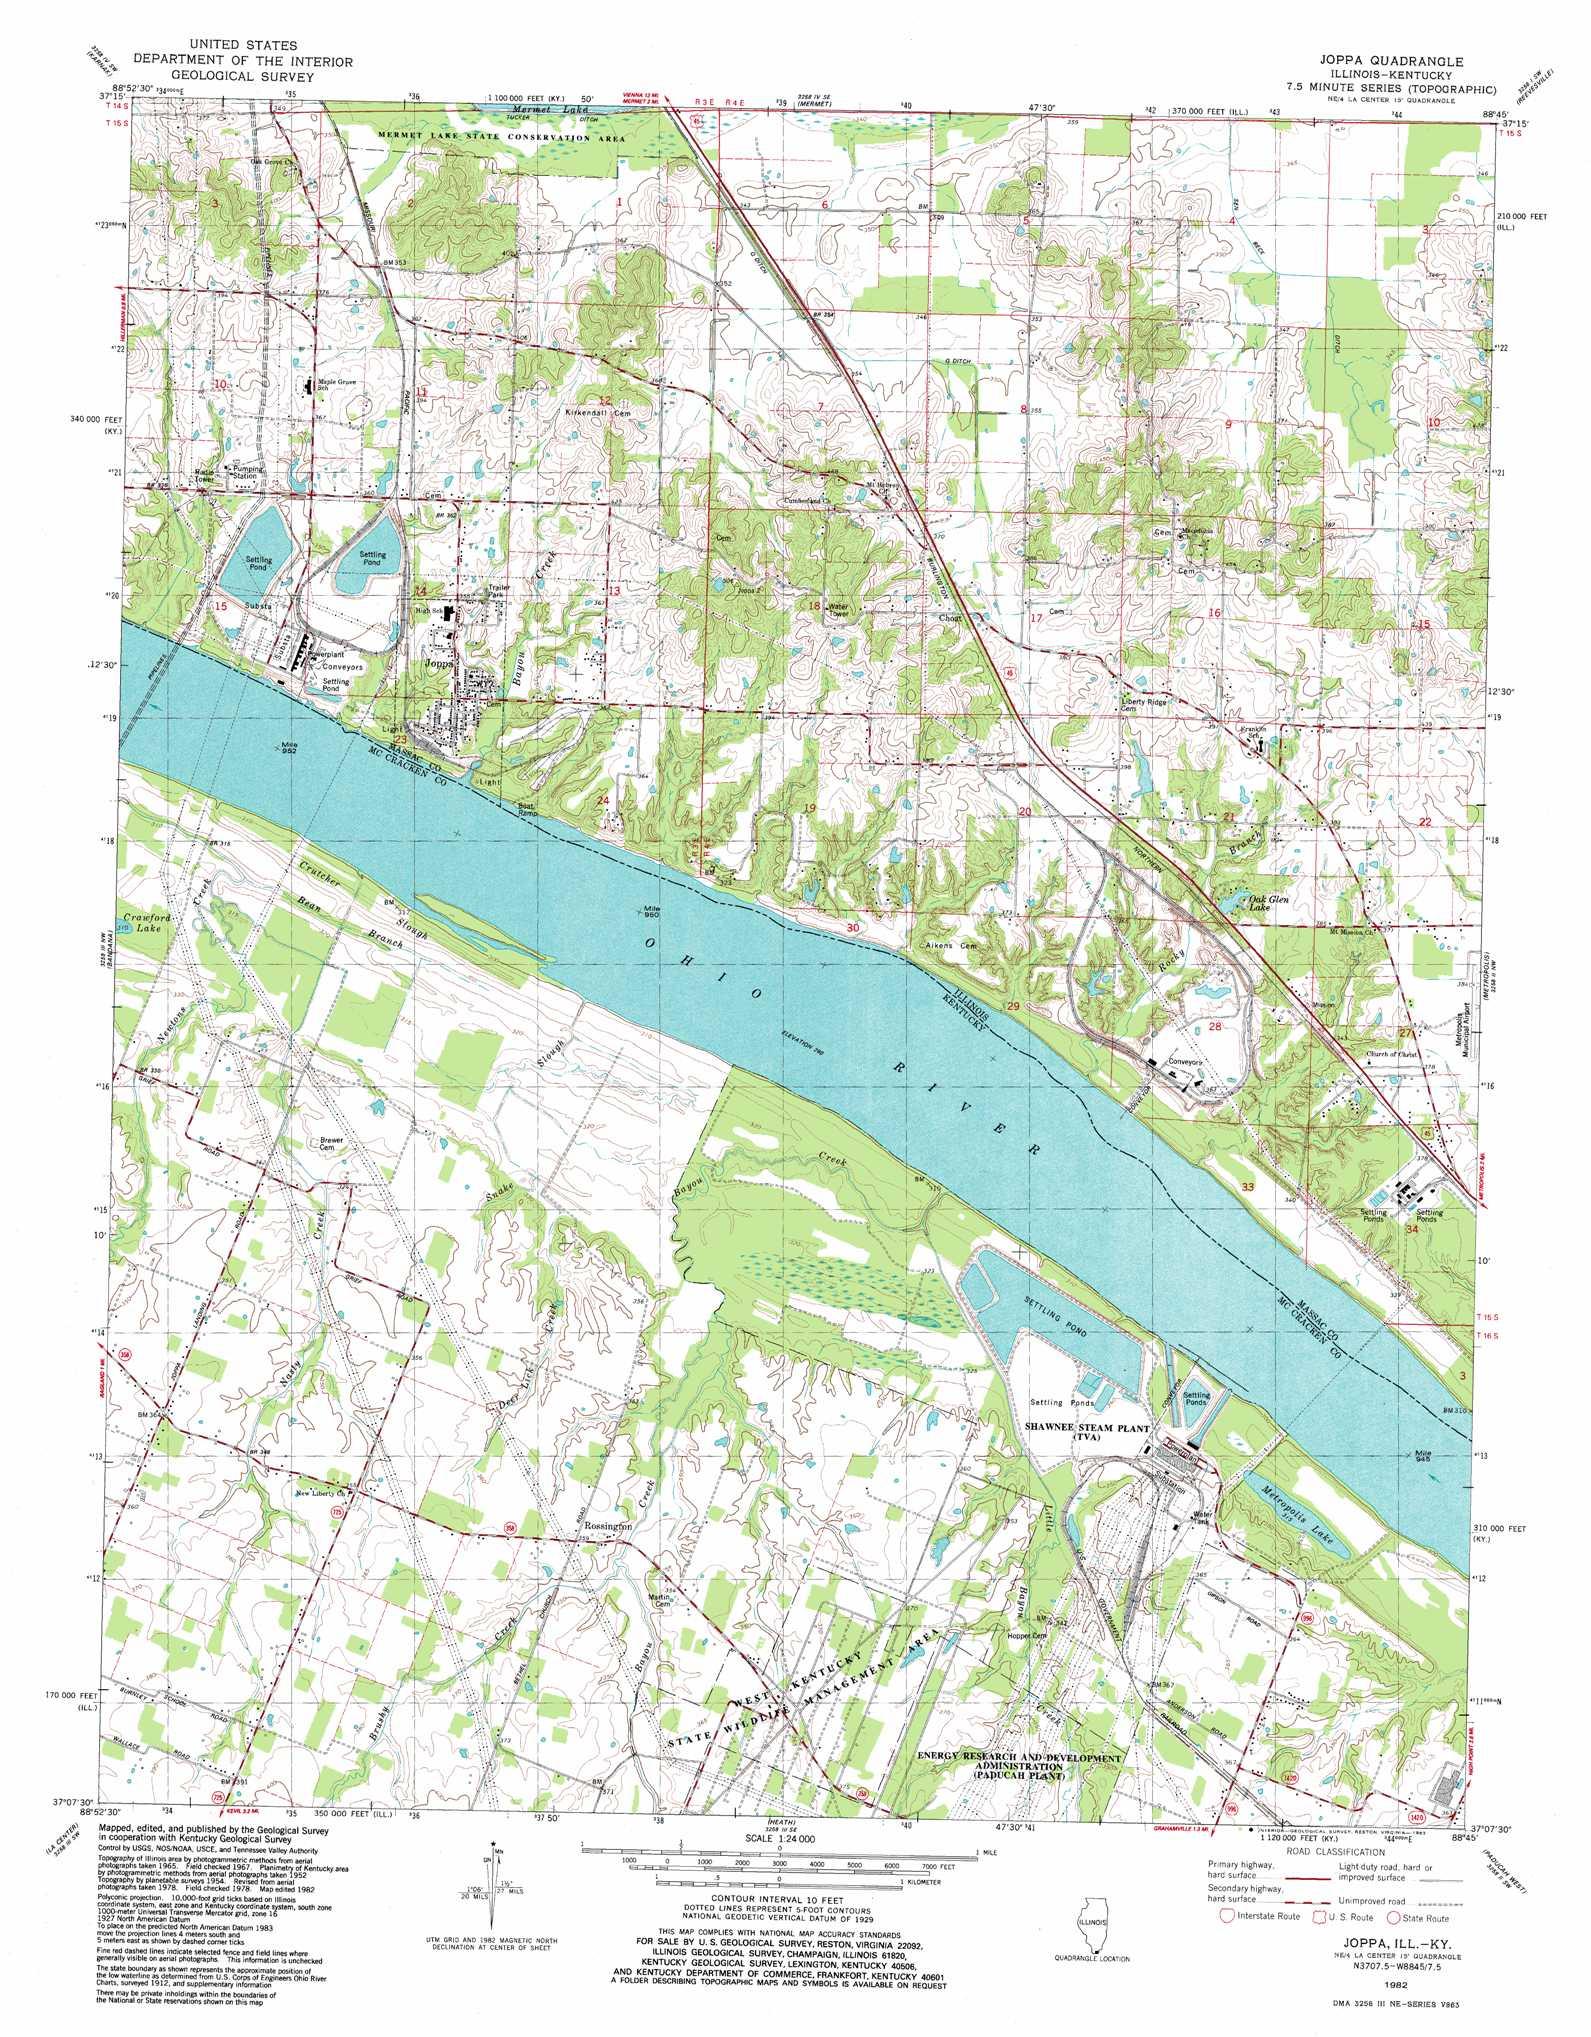 Joppa topographic map, KY, IL - USGS Topo Quad 37088b7